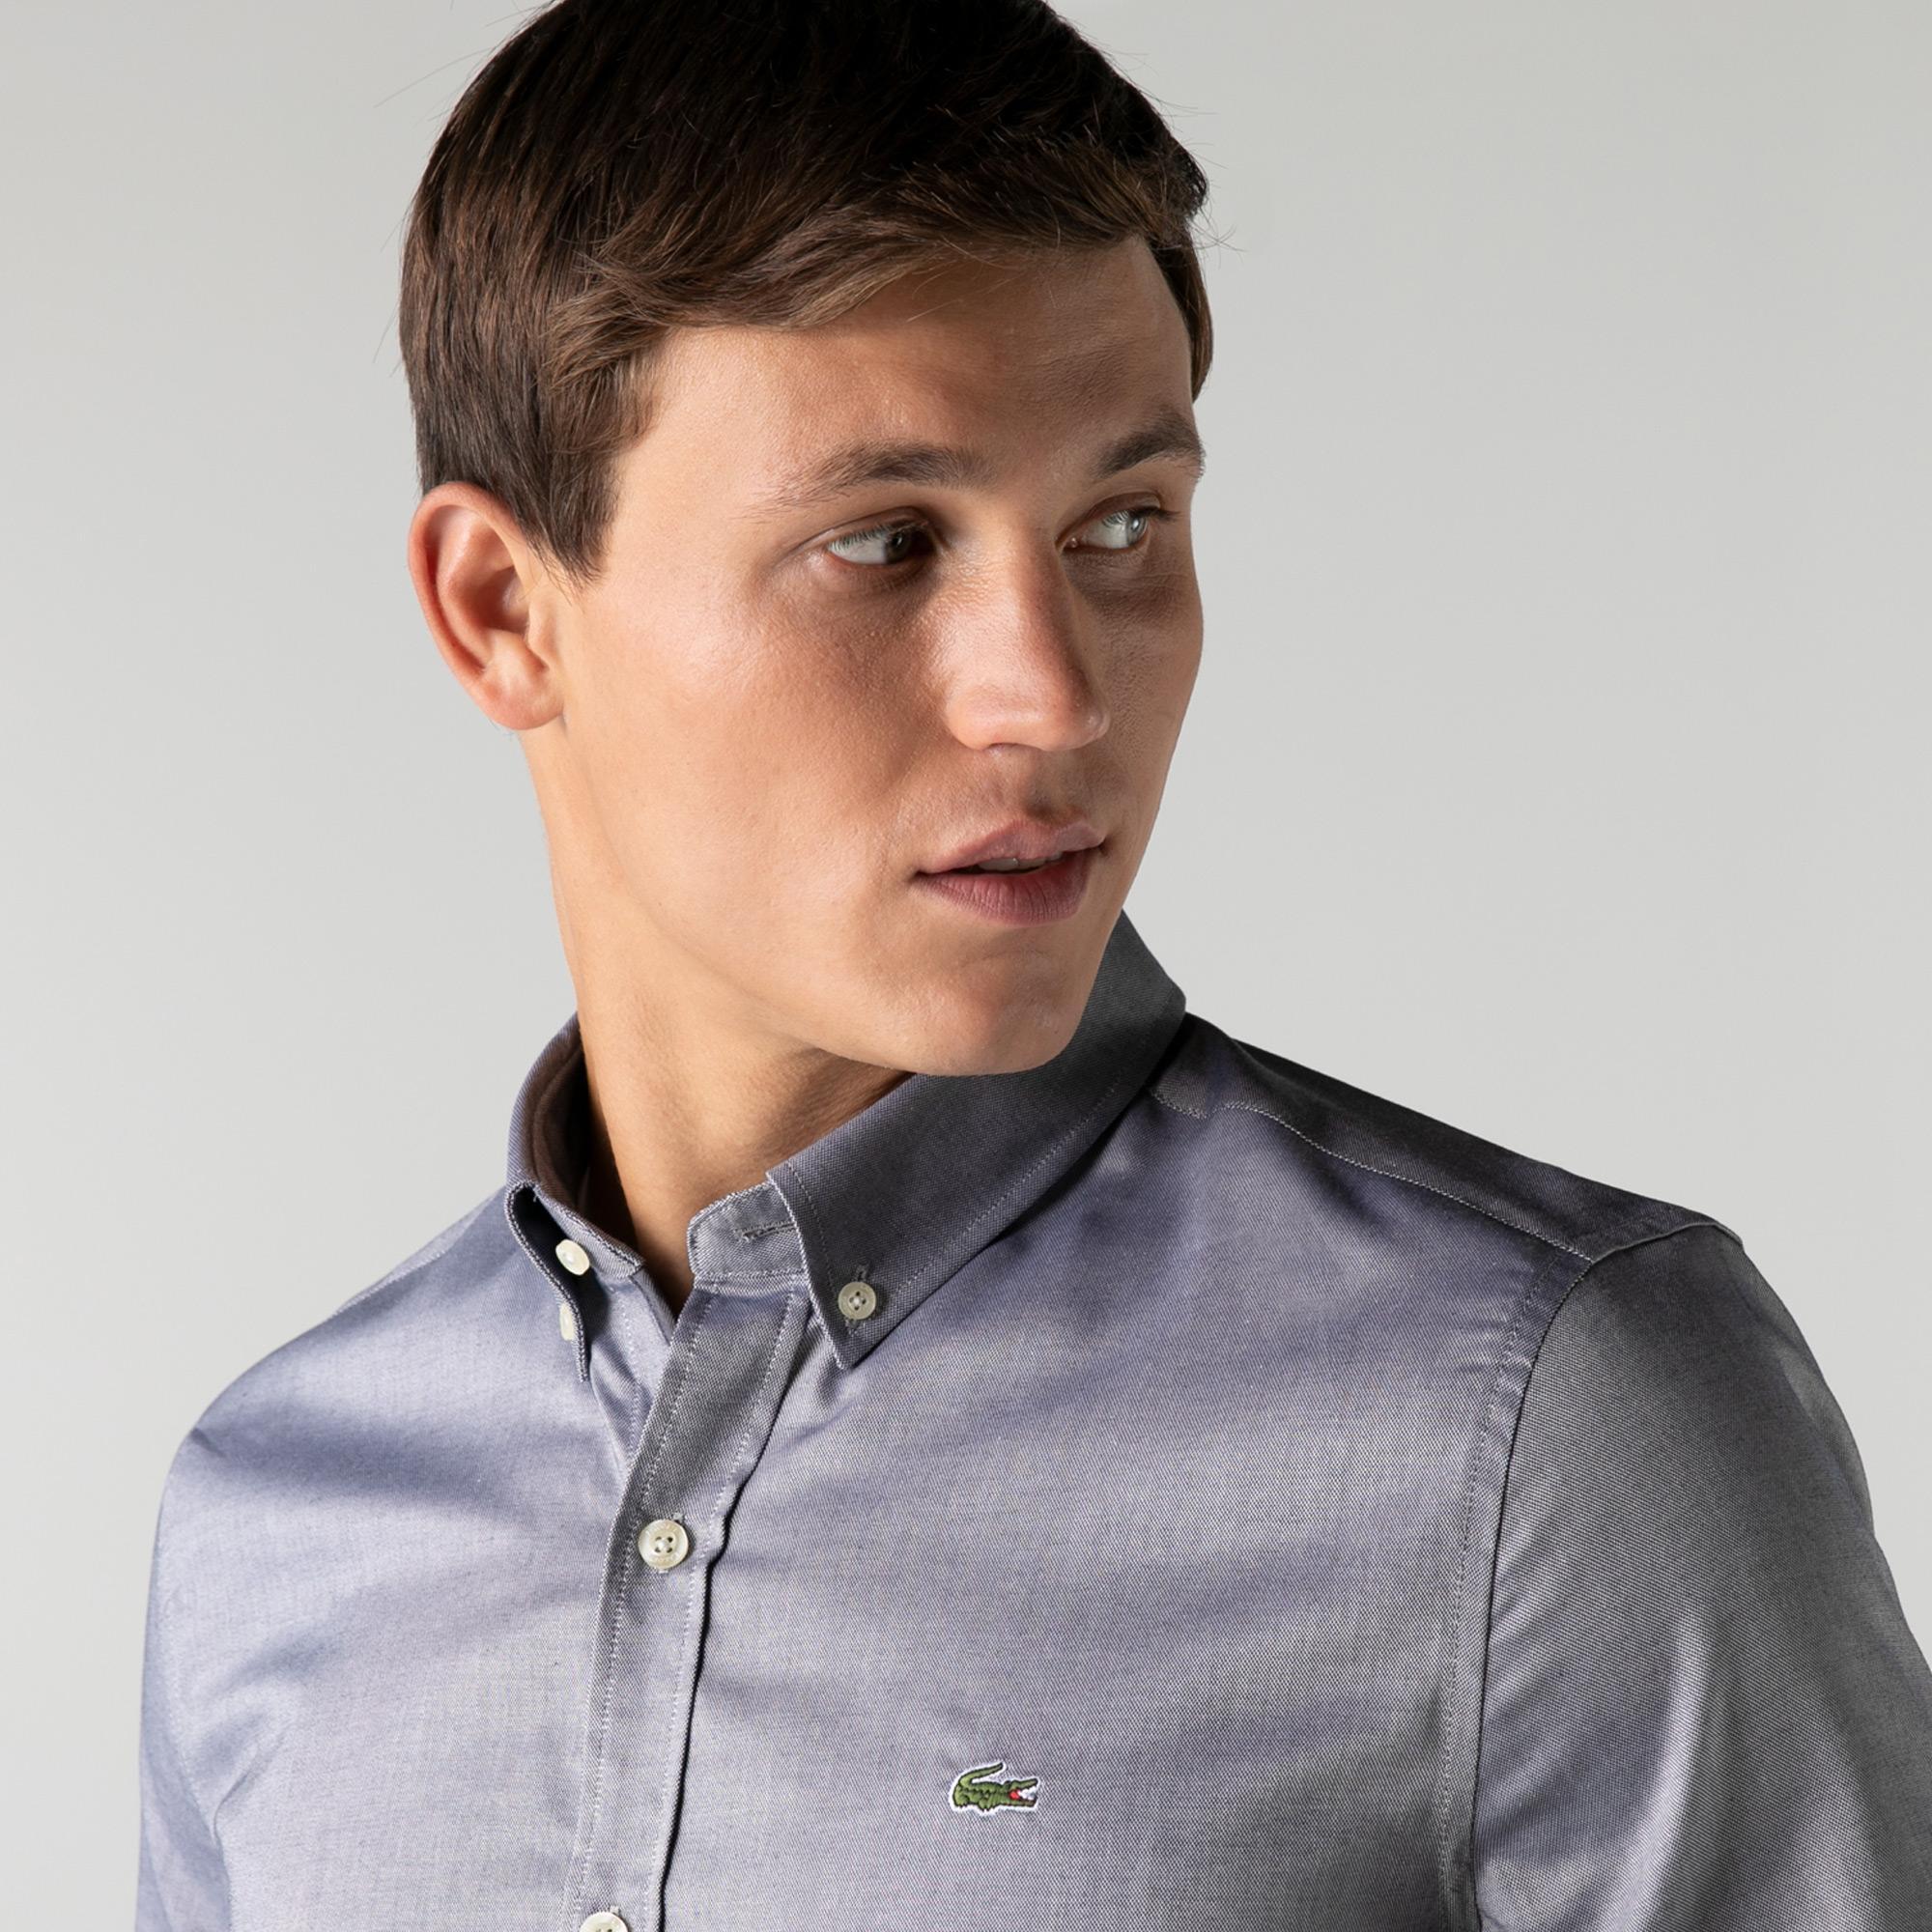 Lacoste Erkek Slim Fit Kısa Kollu Gri Gömlek